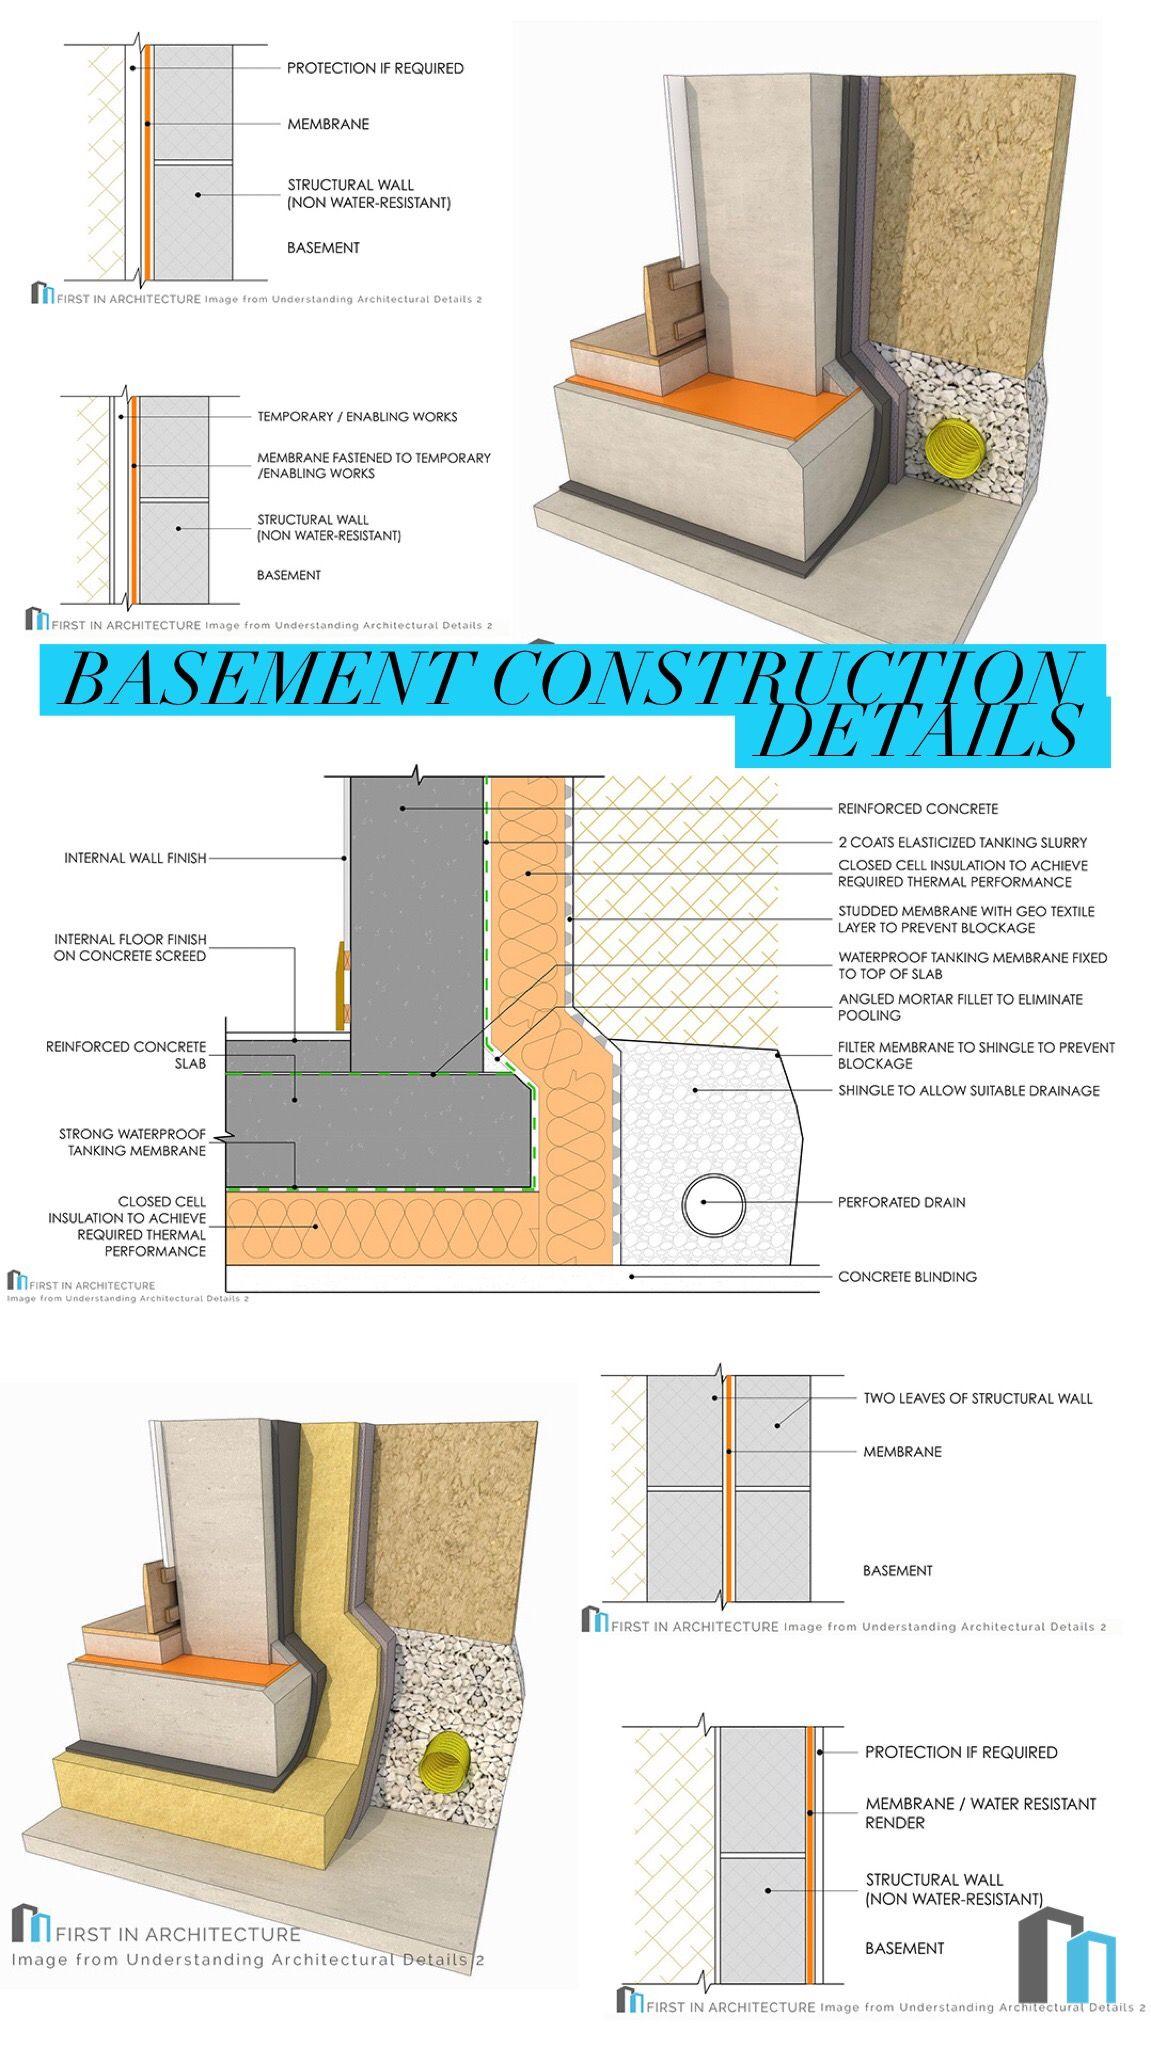 Basement Construction Details Type A Basement Construction Building Cladding Construction